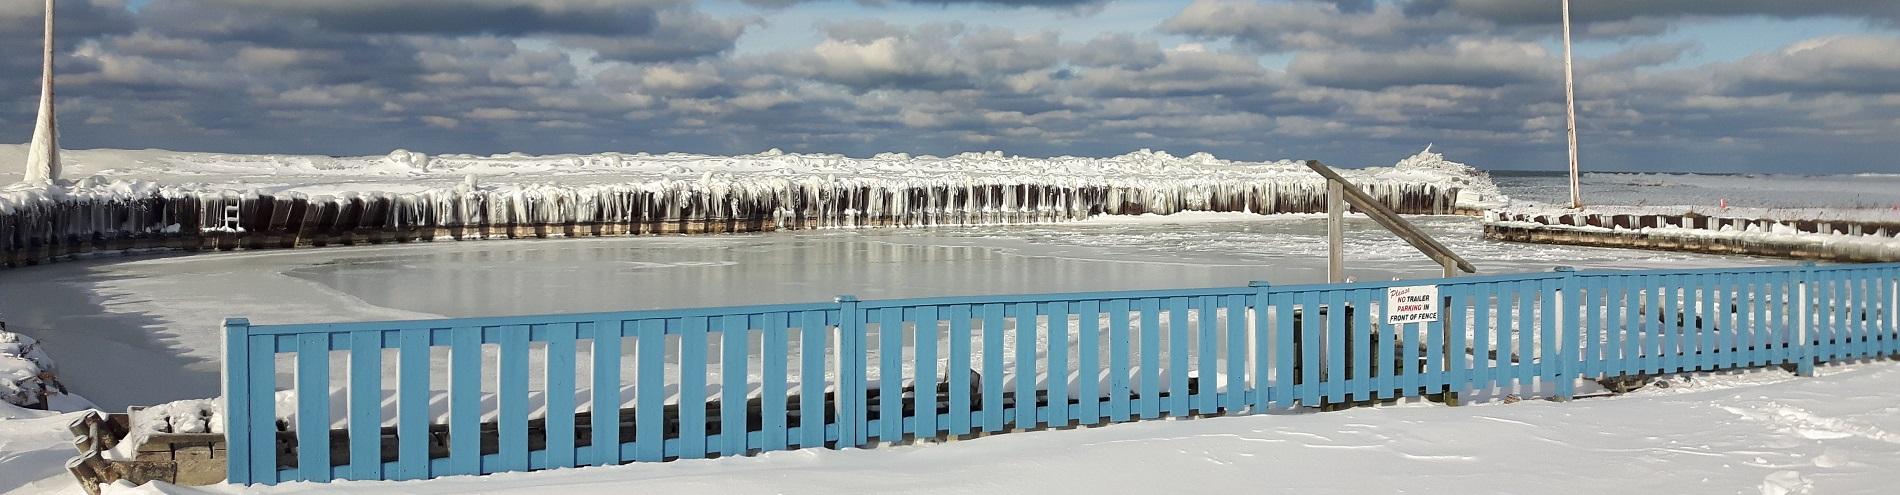 Point Clark Harbour Winter